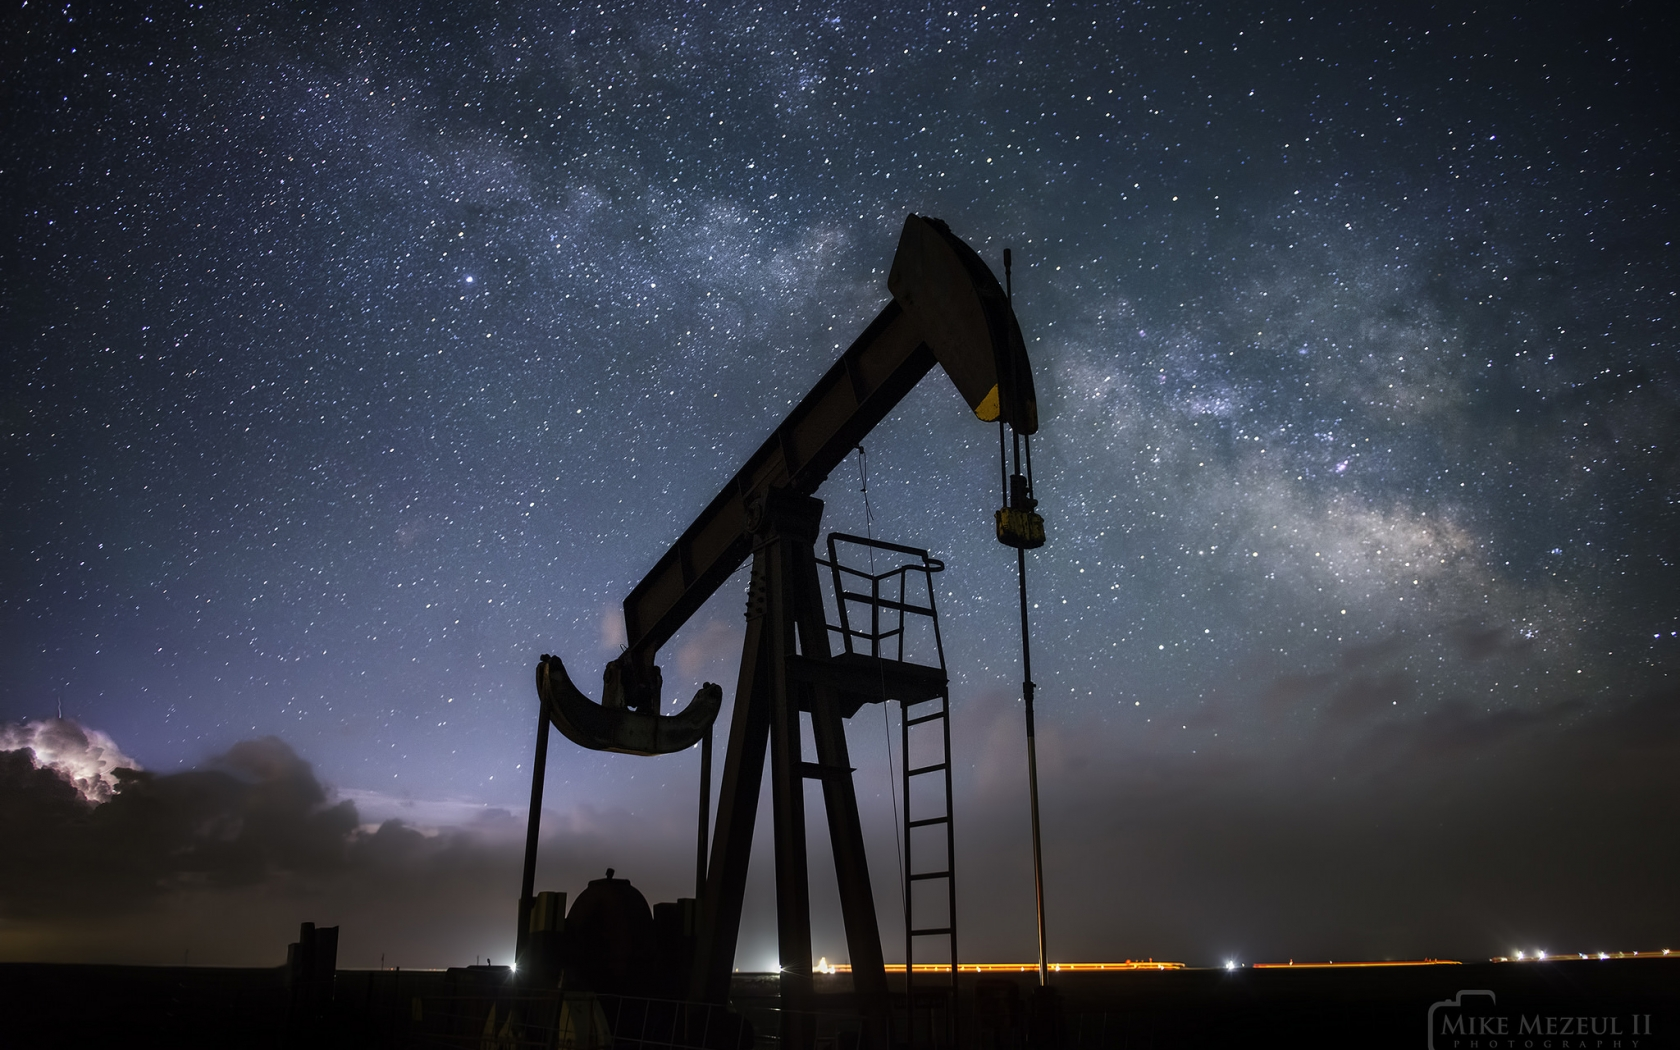 Un caballito petrolero - 1680x1050